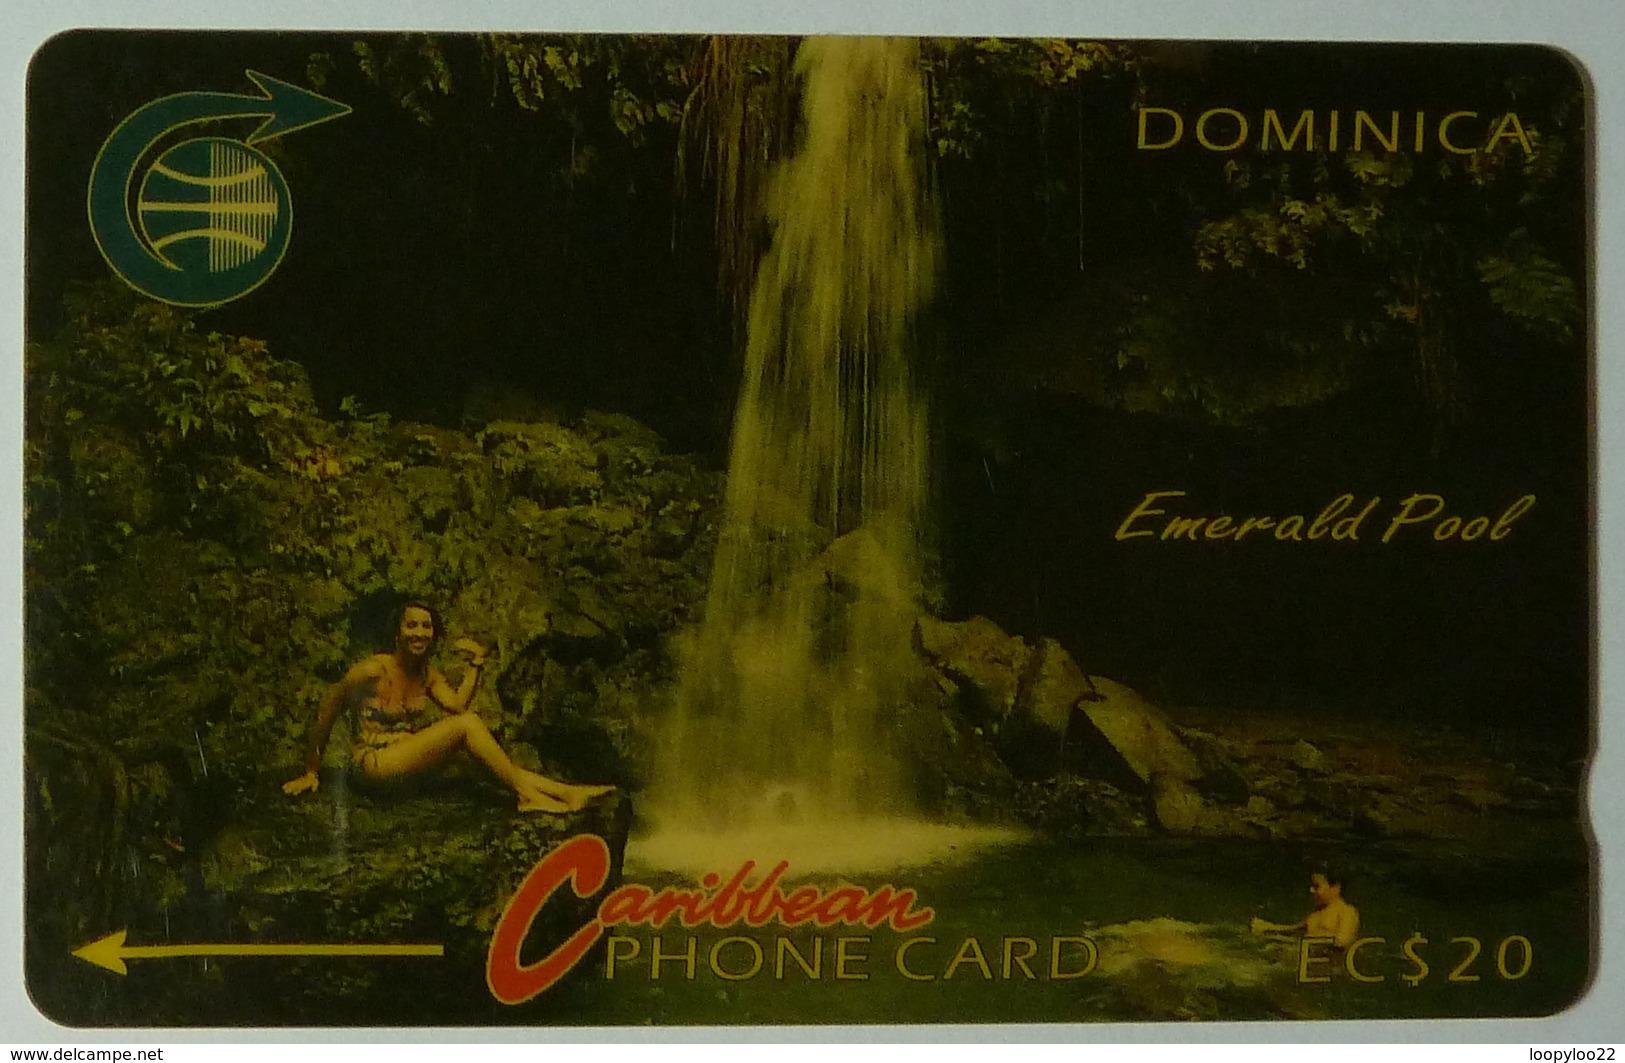 DOMINICA - GPT - 4CDMB - $20 - DOM-4B - Emerald Pool - White Strip - Used - Dominica